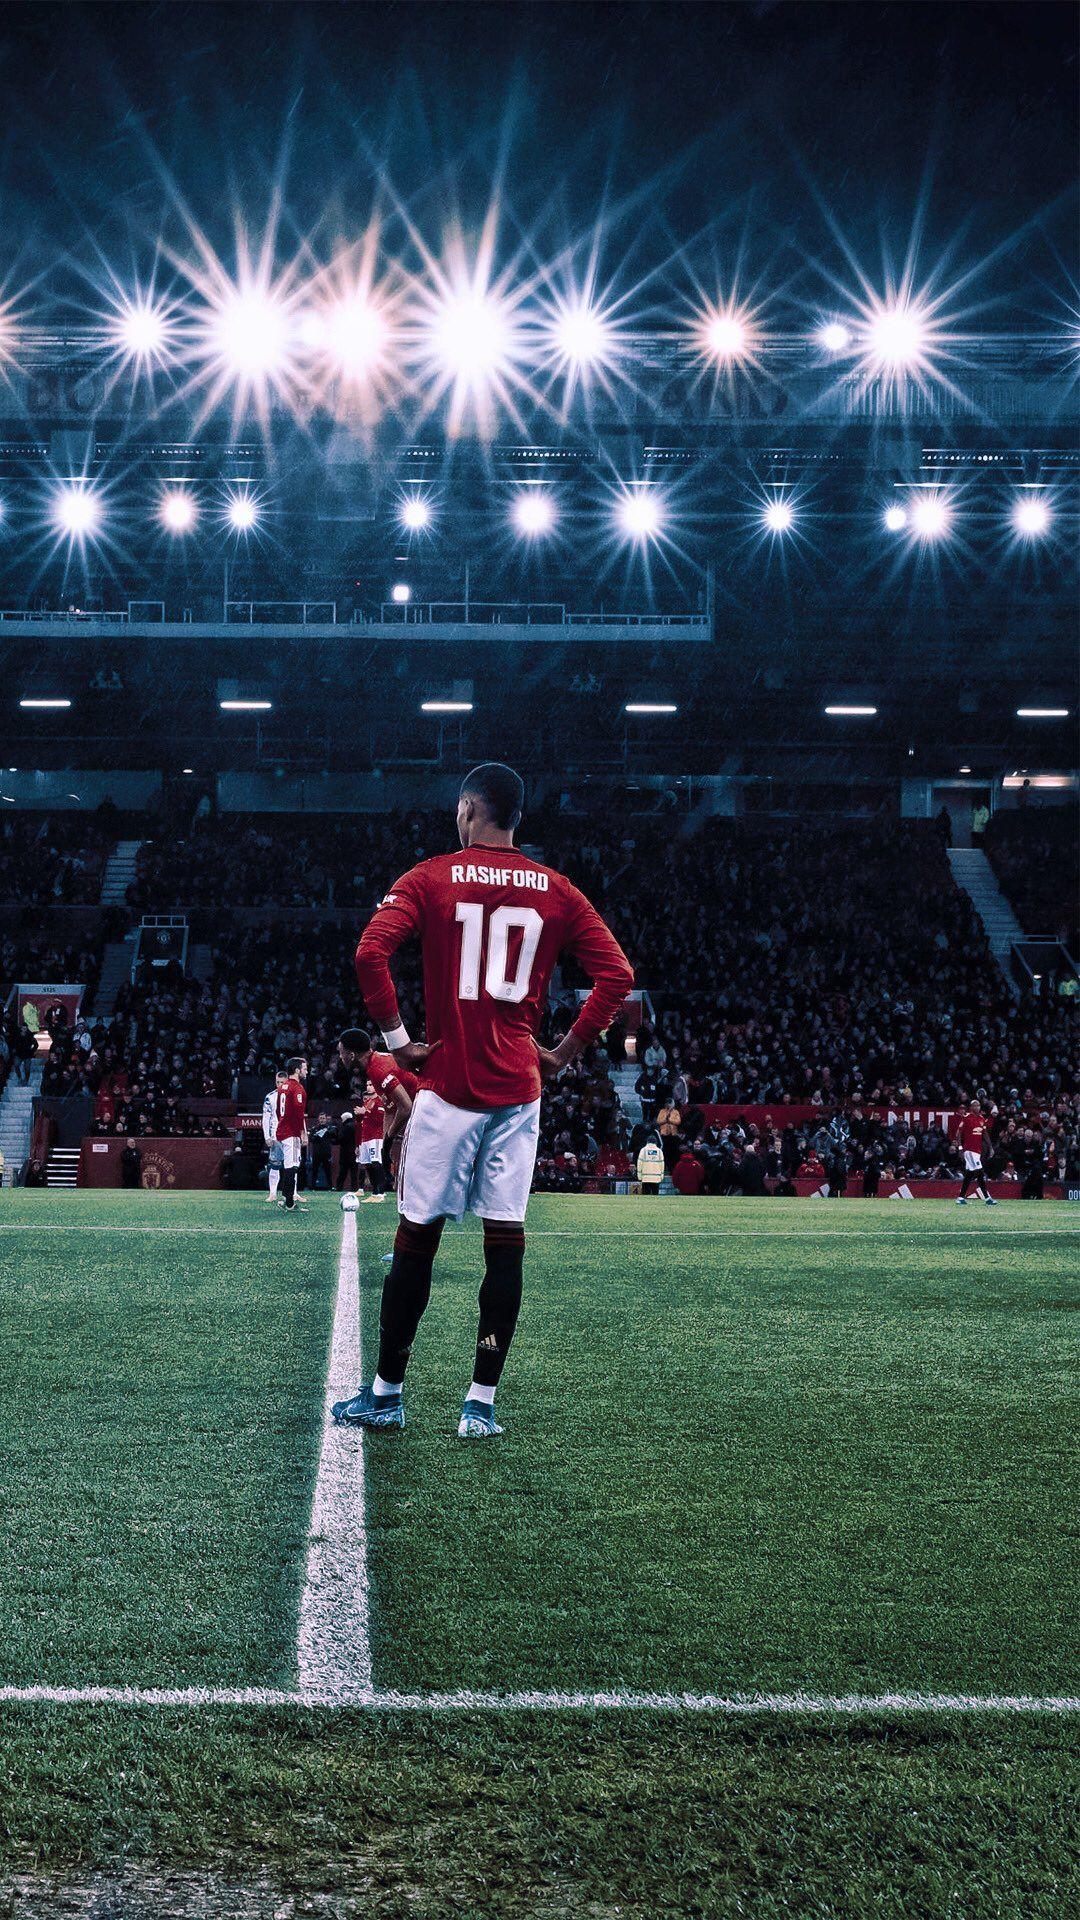 Pin by Дарья Кысиль on MU in 2020 | Manchester united